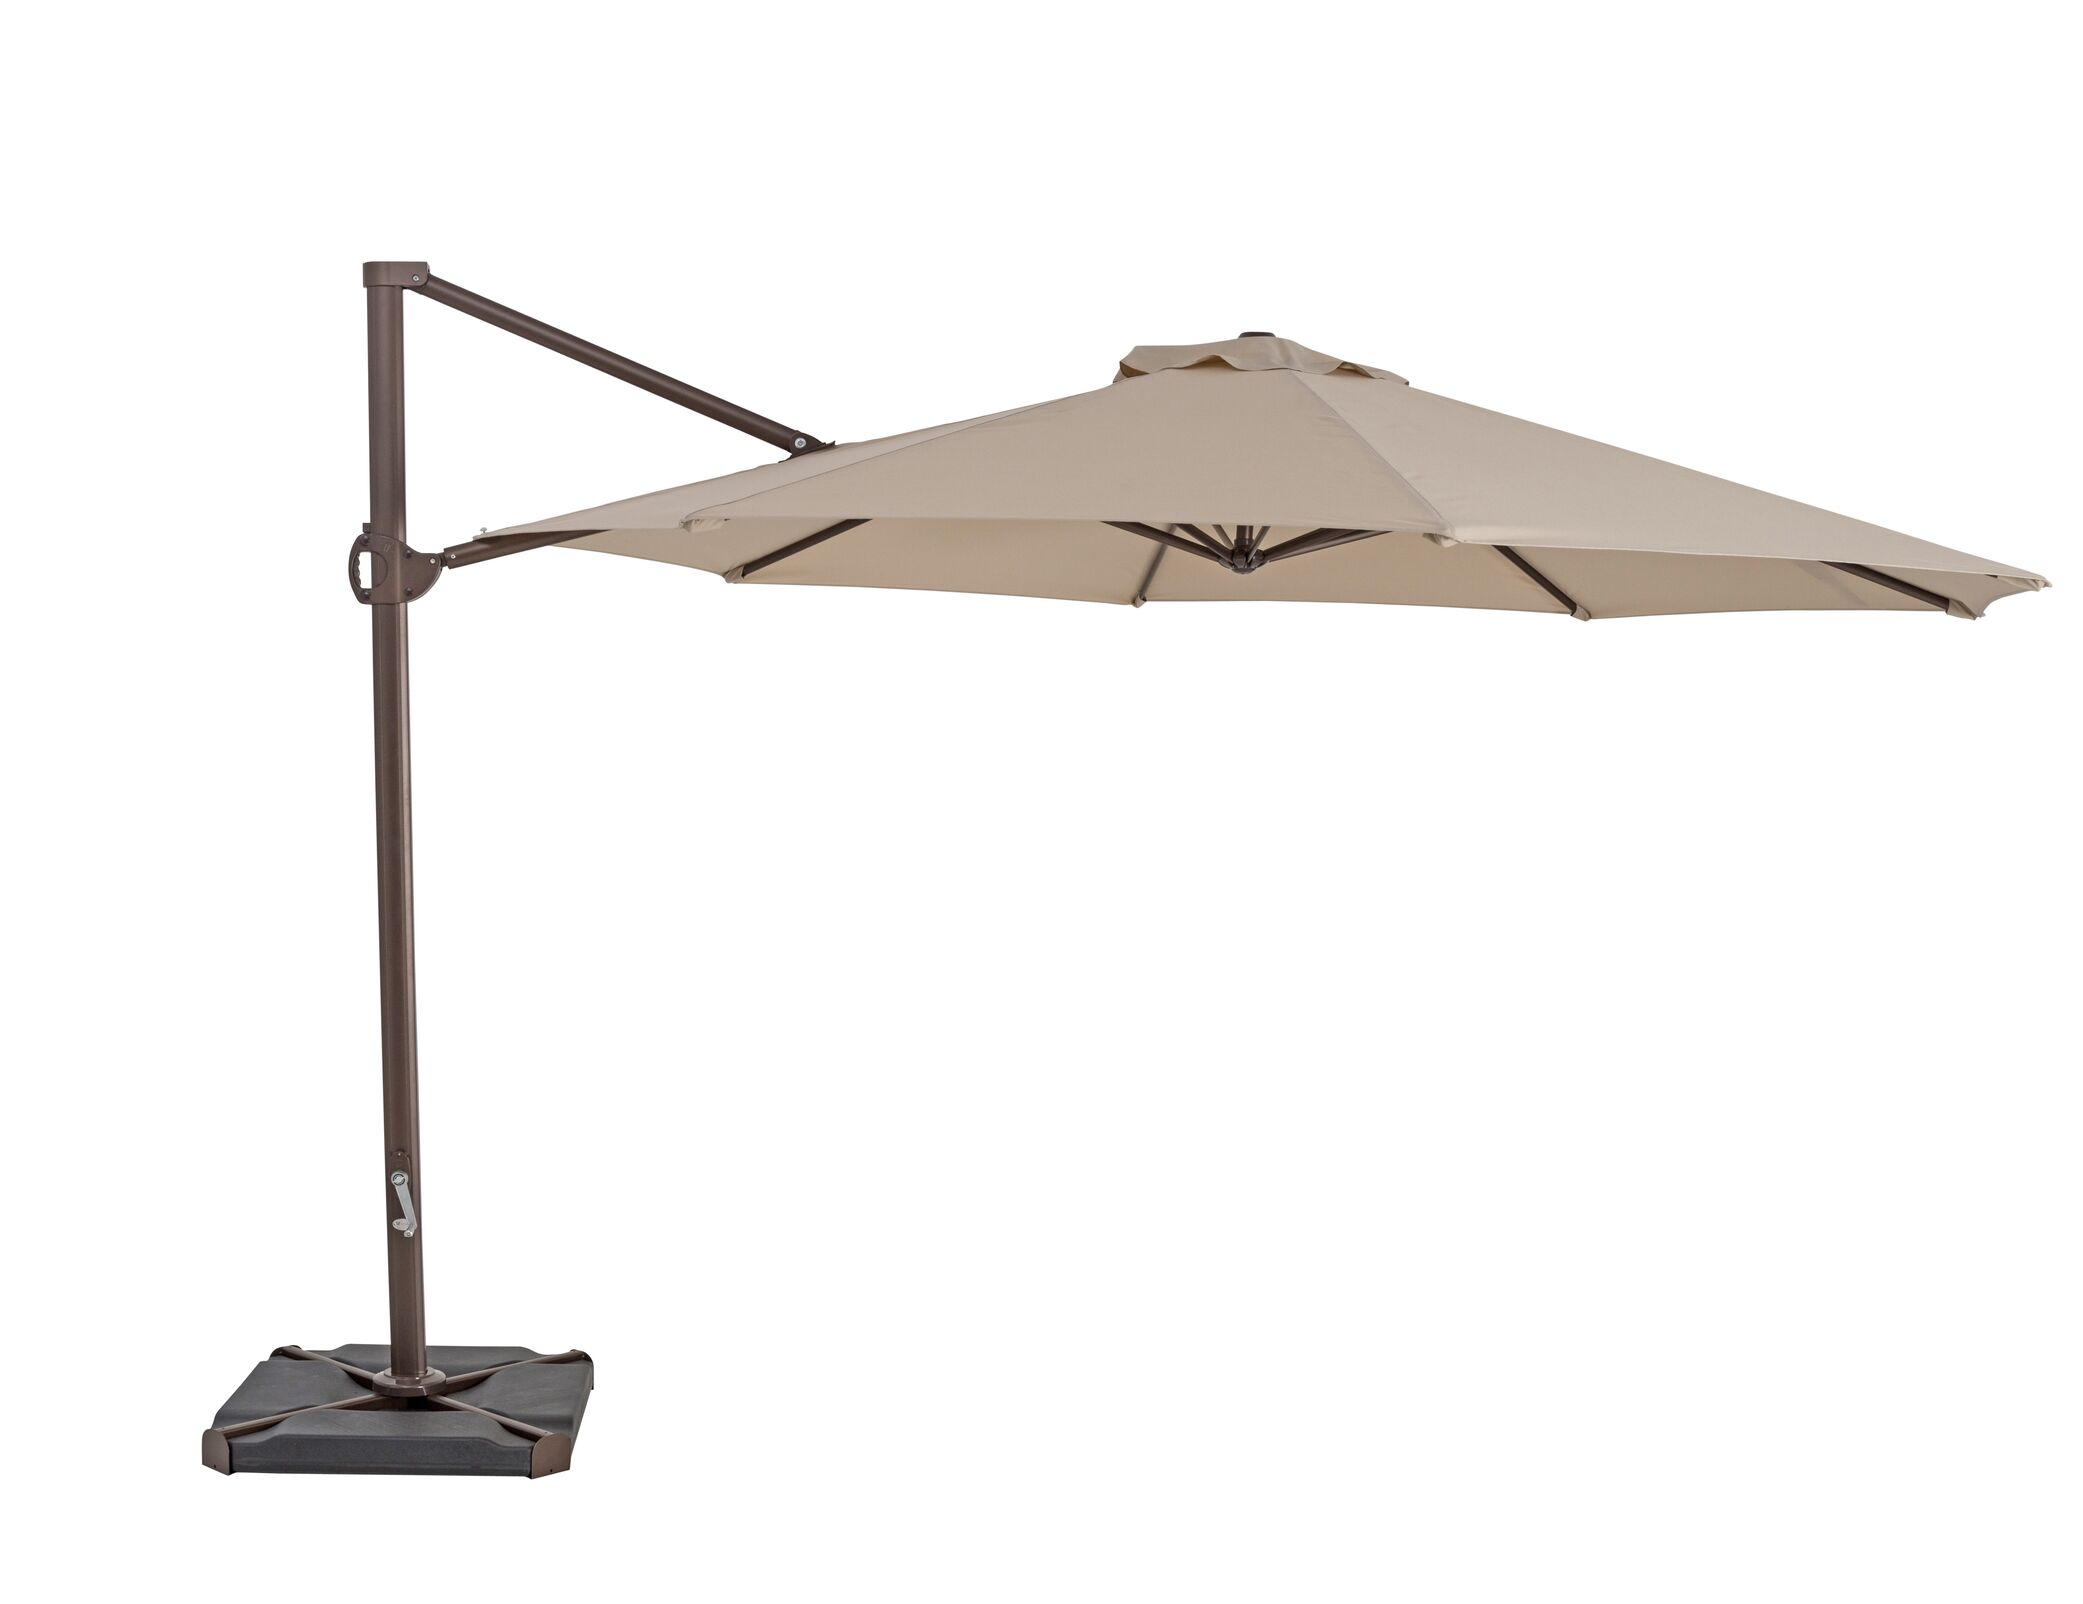 11.5' Cantilever Umbrella Color: Antique Beige